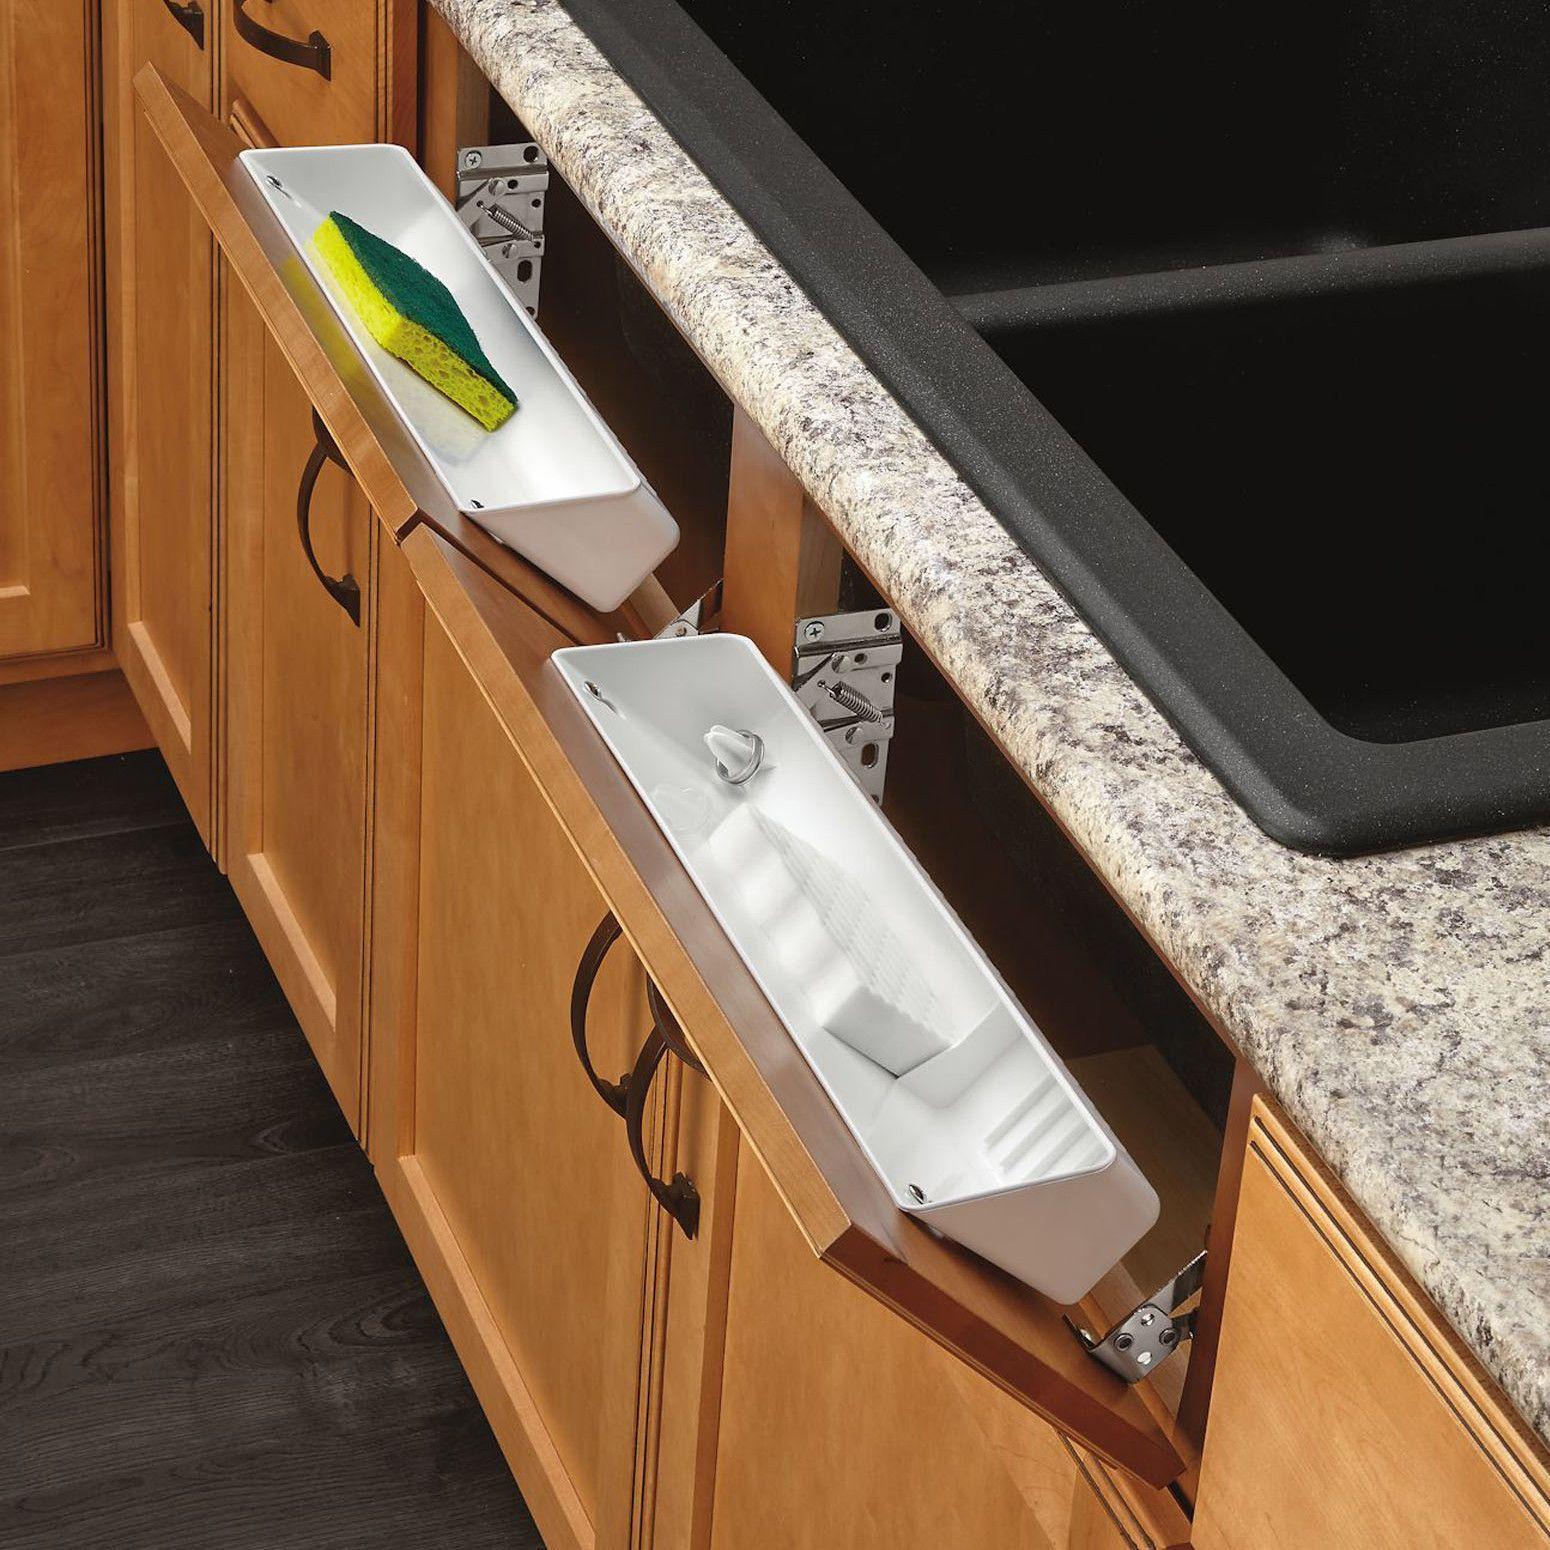 Polymer Tip Out Tray Kitchen Cocinas Armarios Cocina Y Cocinas